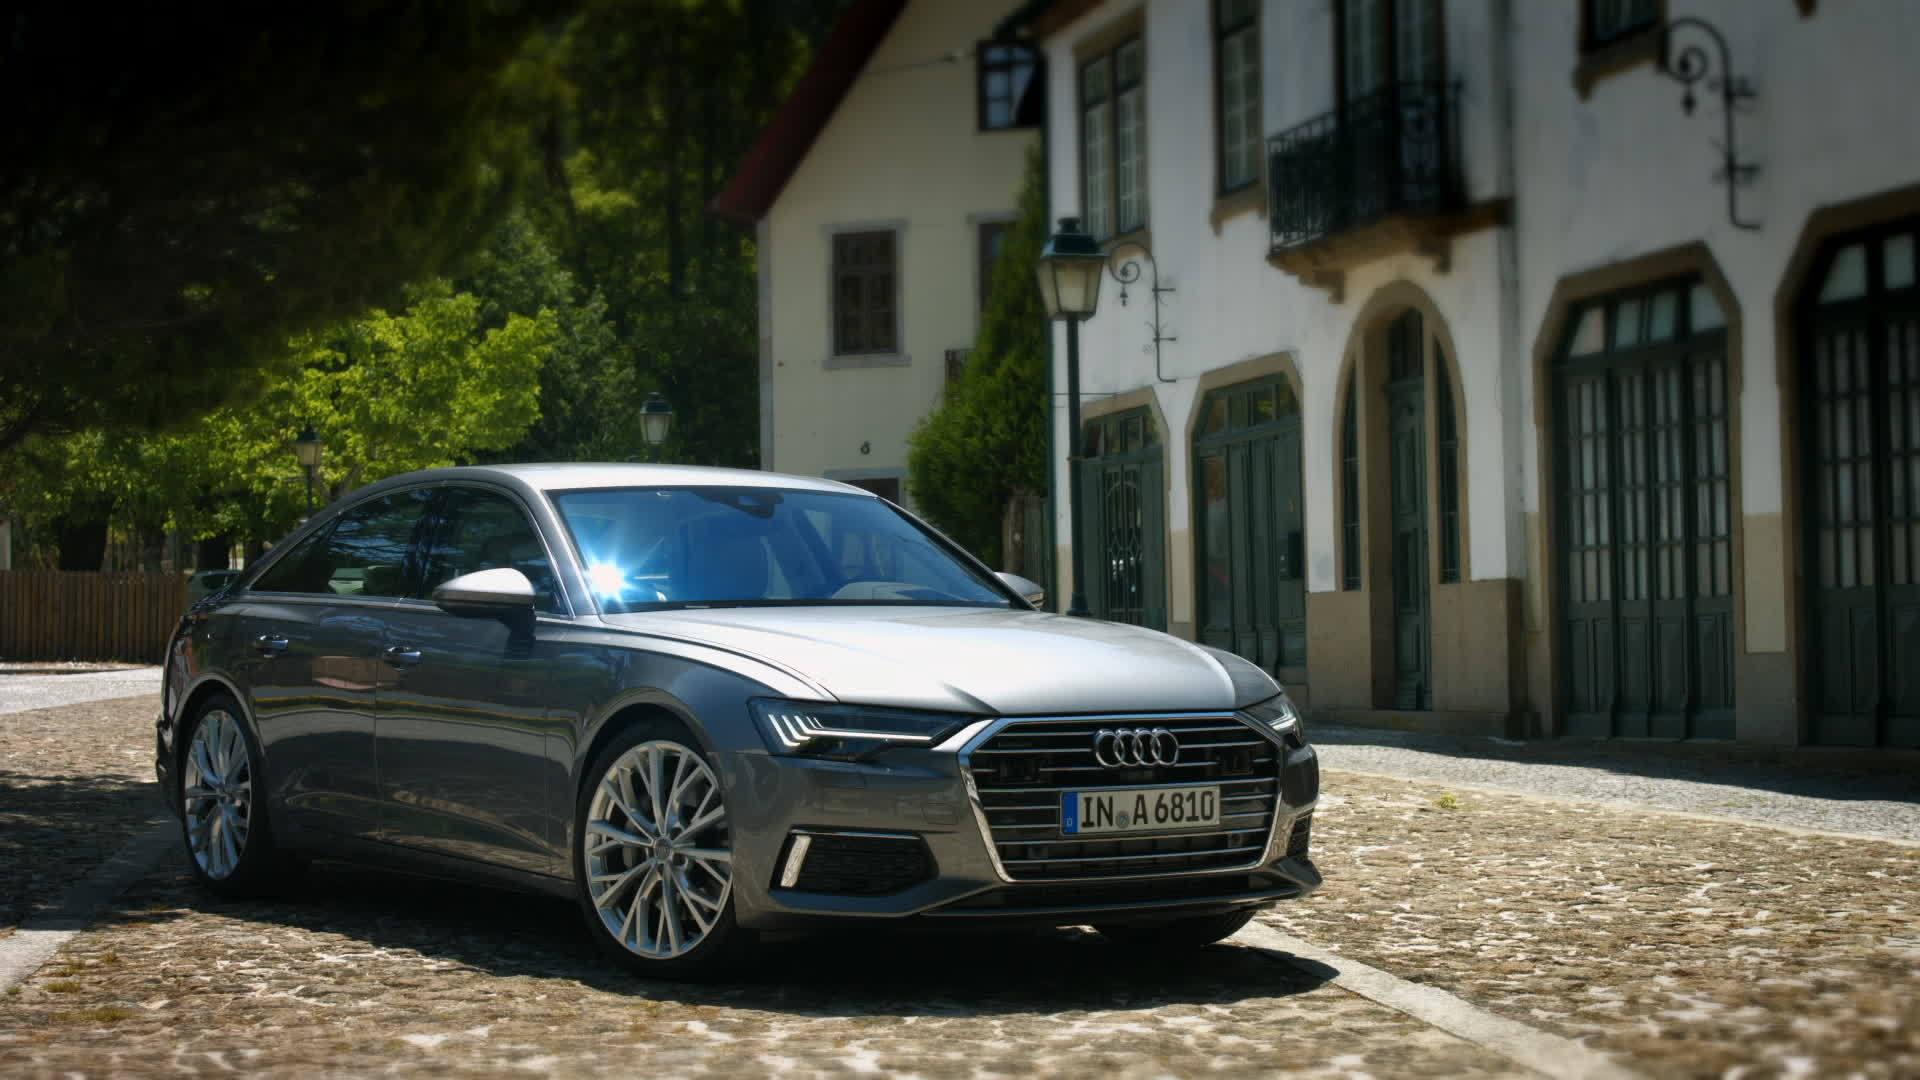 Audi A6 Limousine on Location